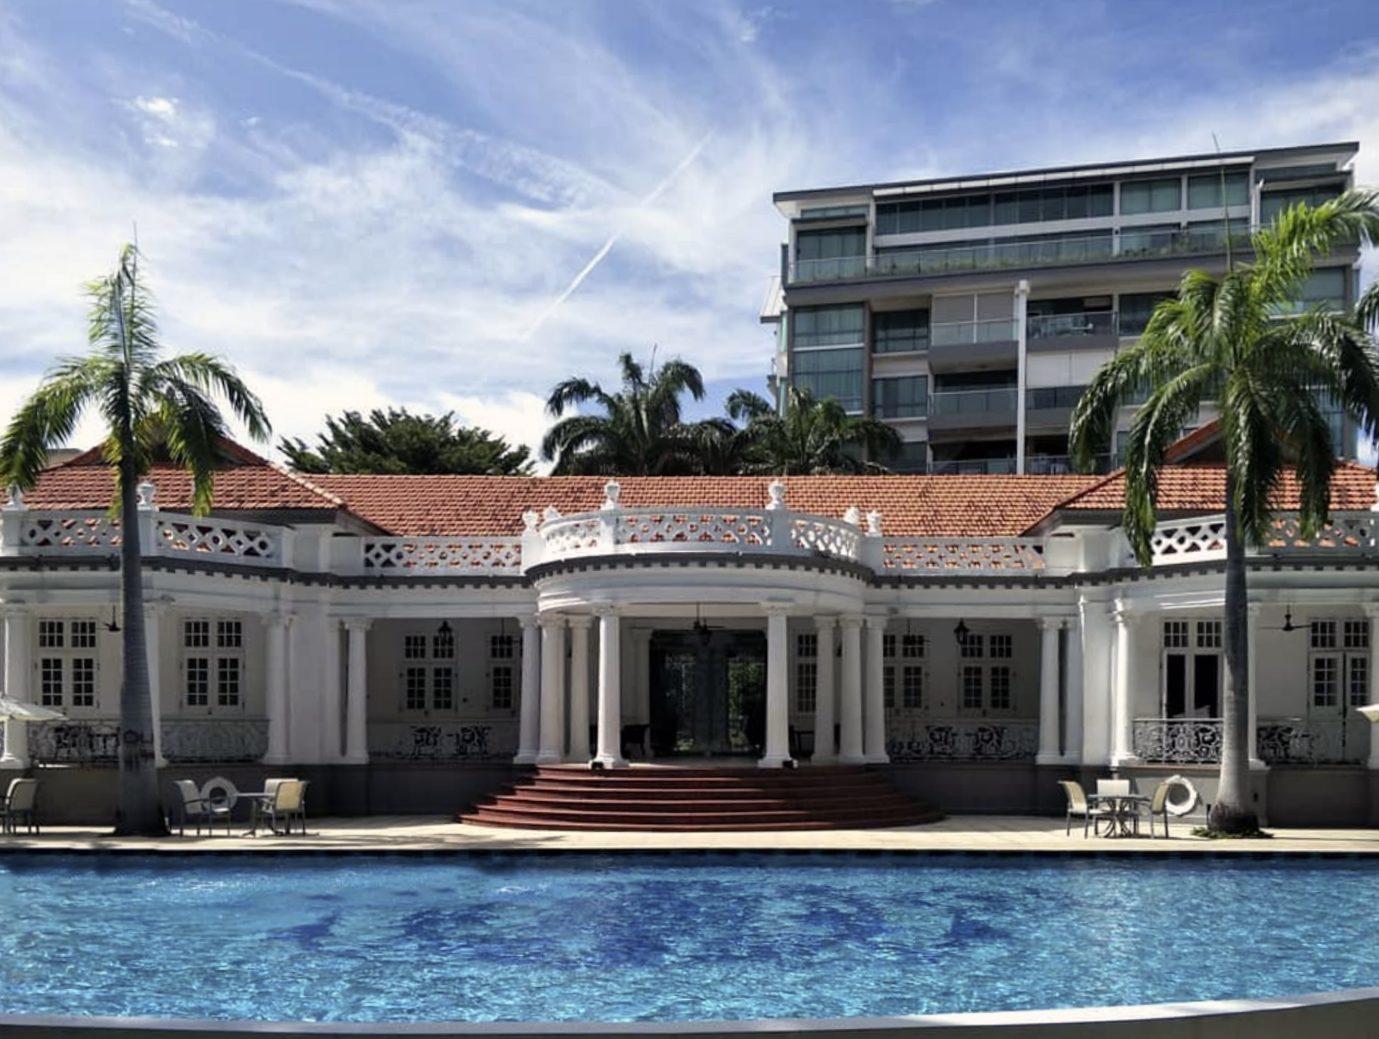 grand duchess st patricks conserved building condo